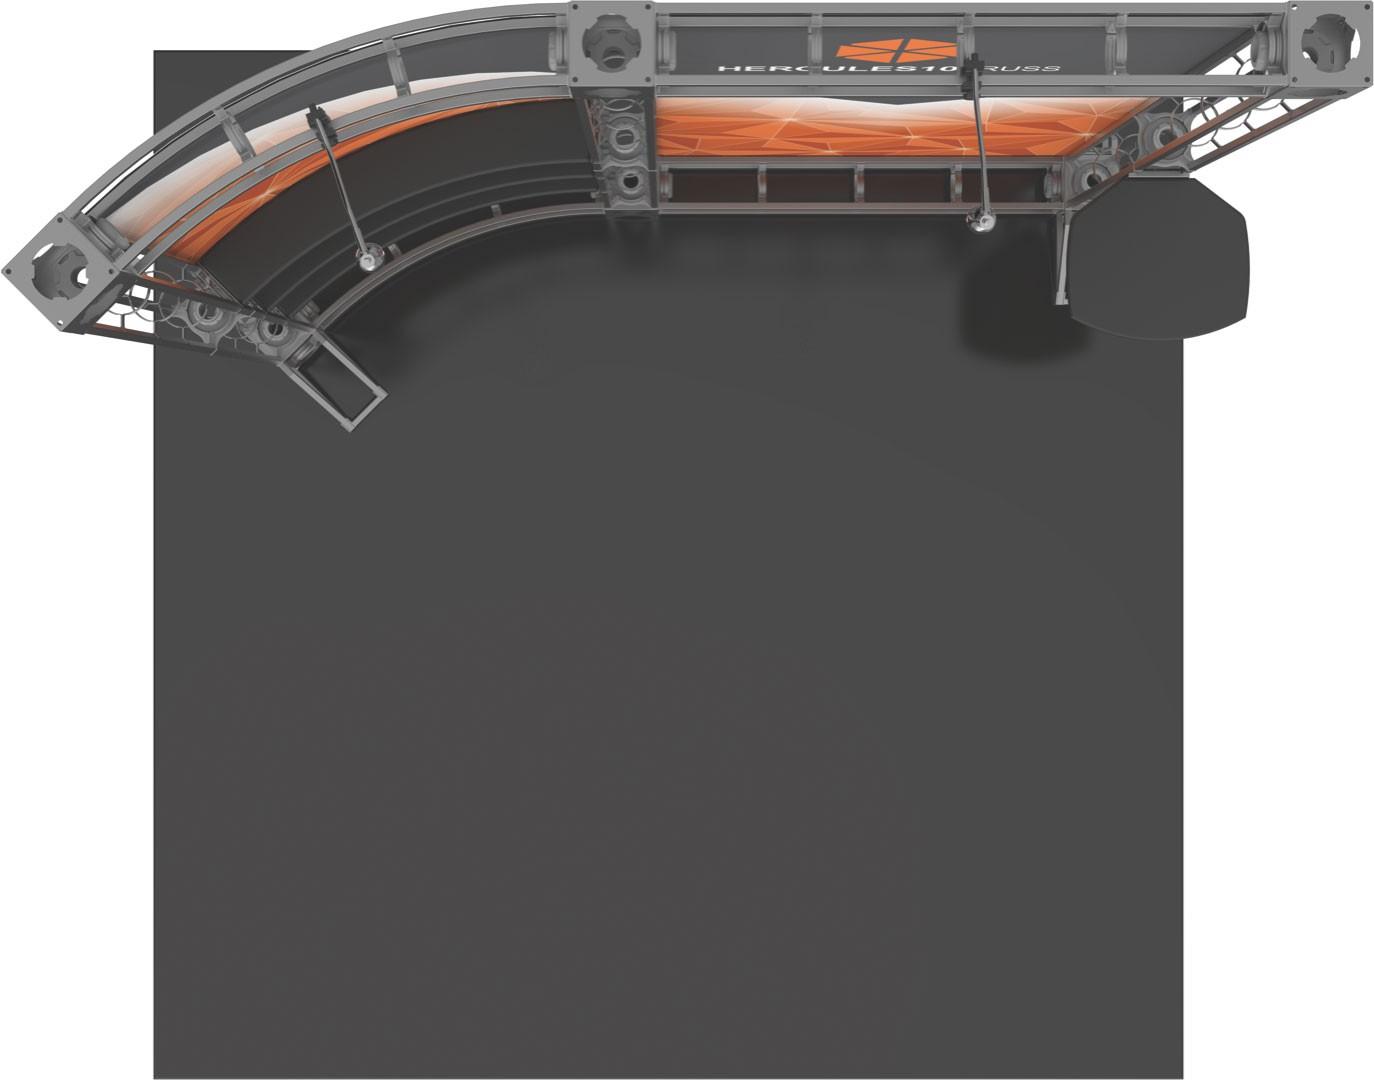 Hercules 10x10 Orbital Express Truss Kit 10